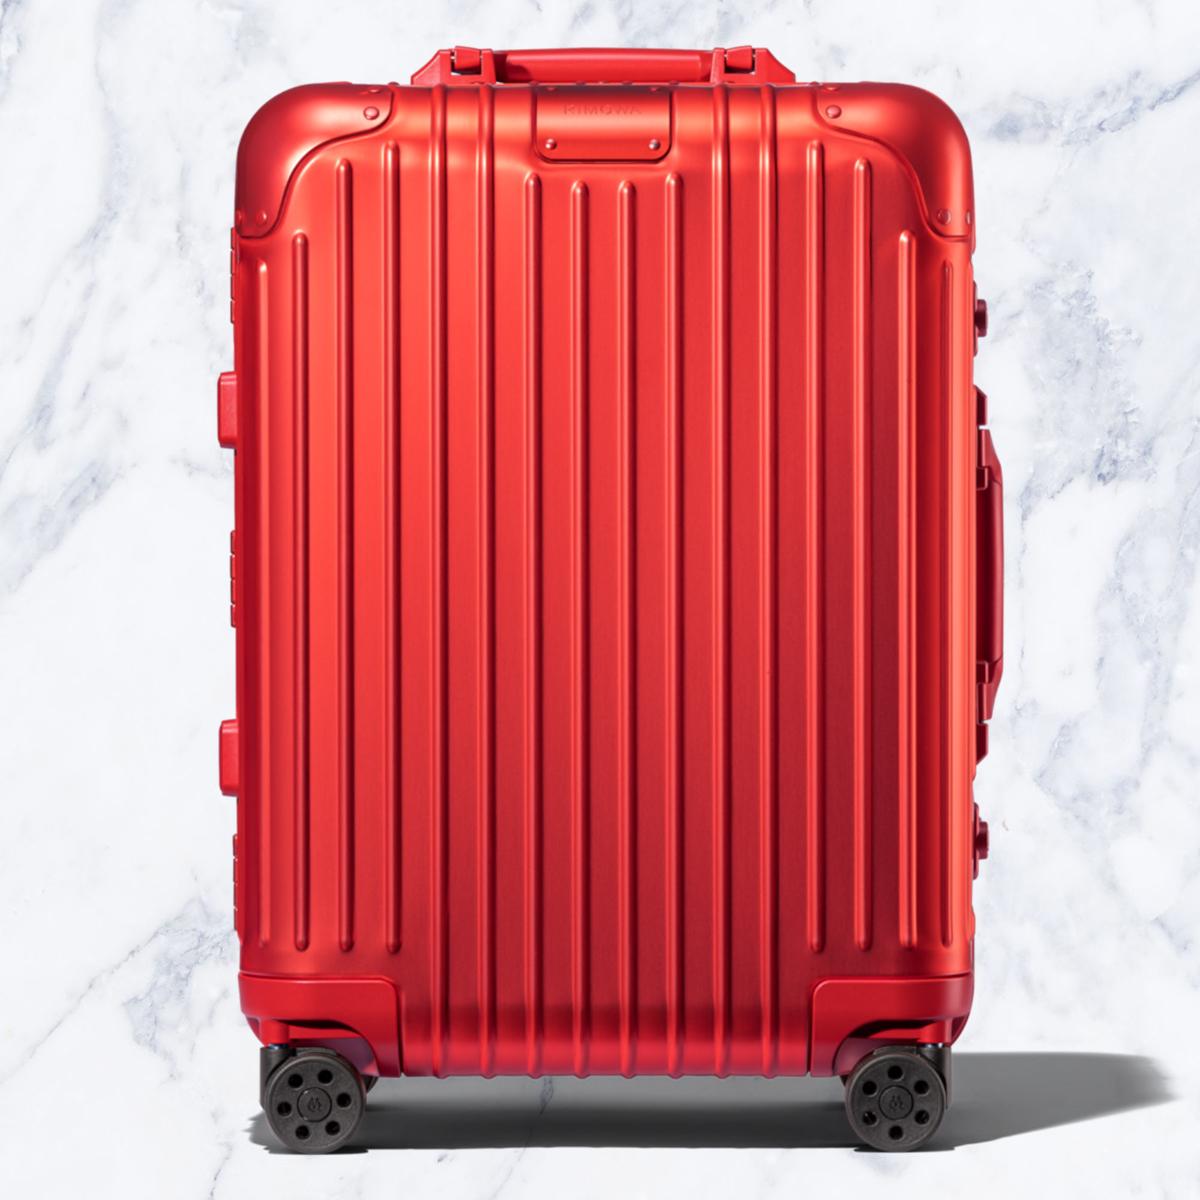 RIMOWA(リモワ)スーツケース リモワ オリジナル 925.53.06.4 キャビン 35リットル 4輪画像